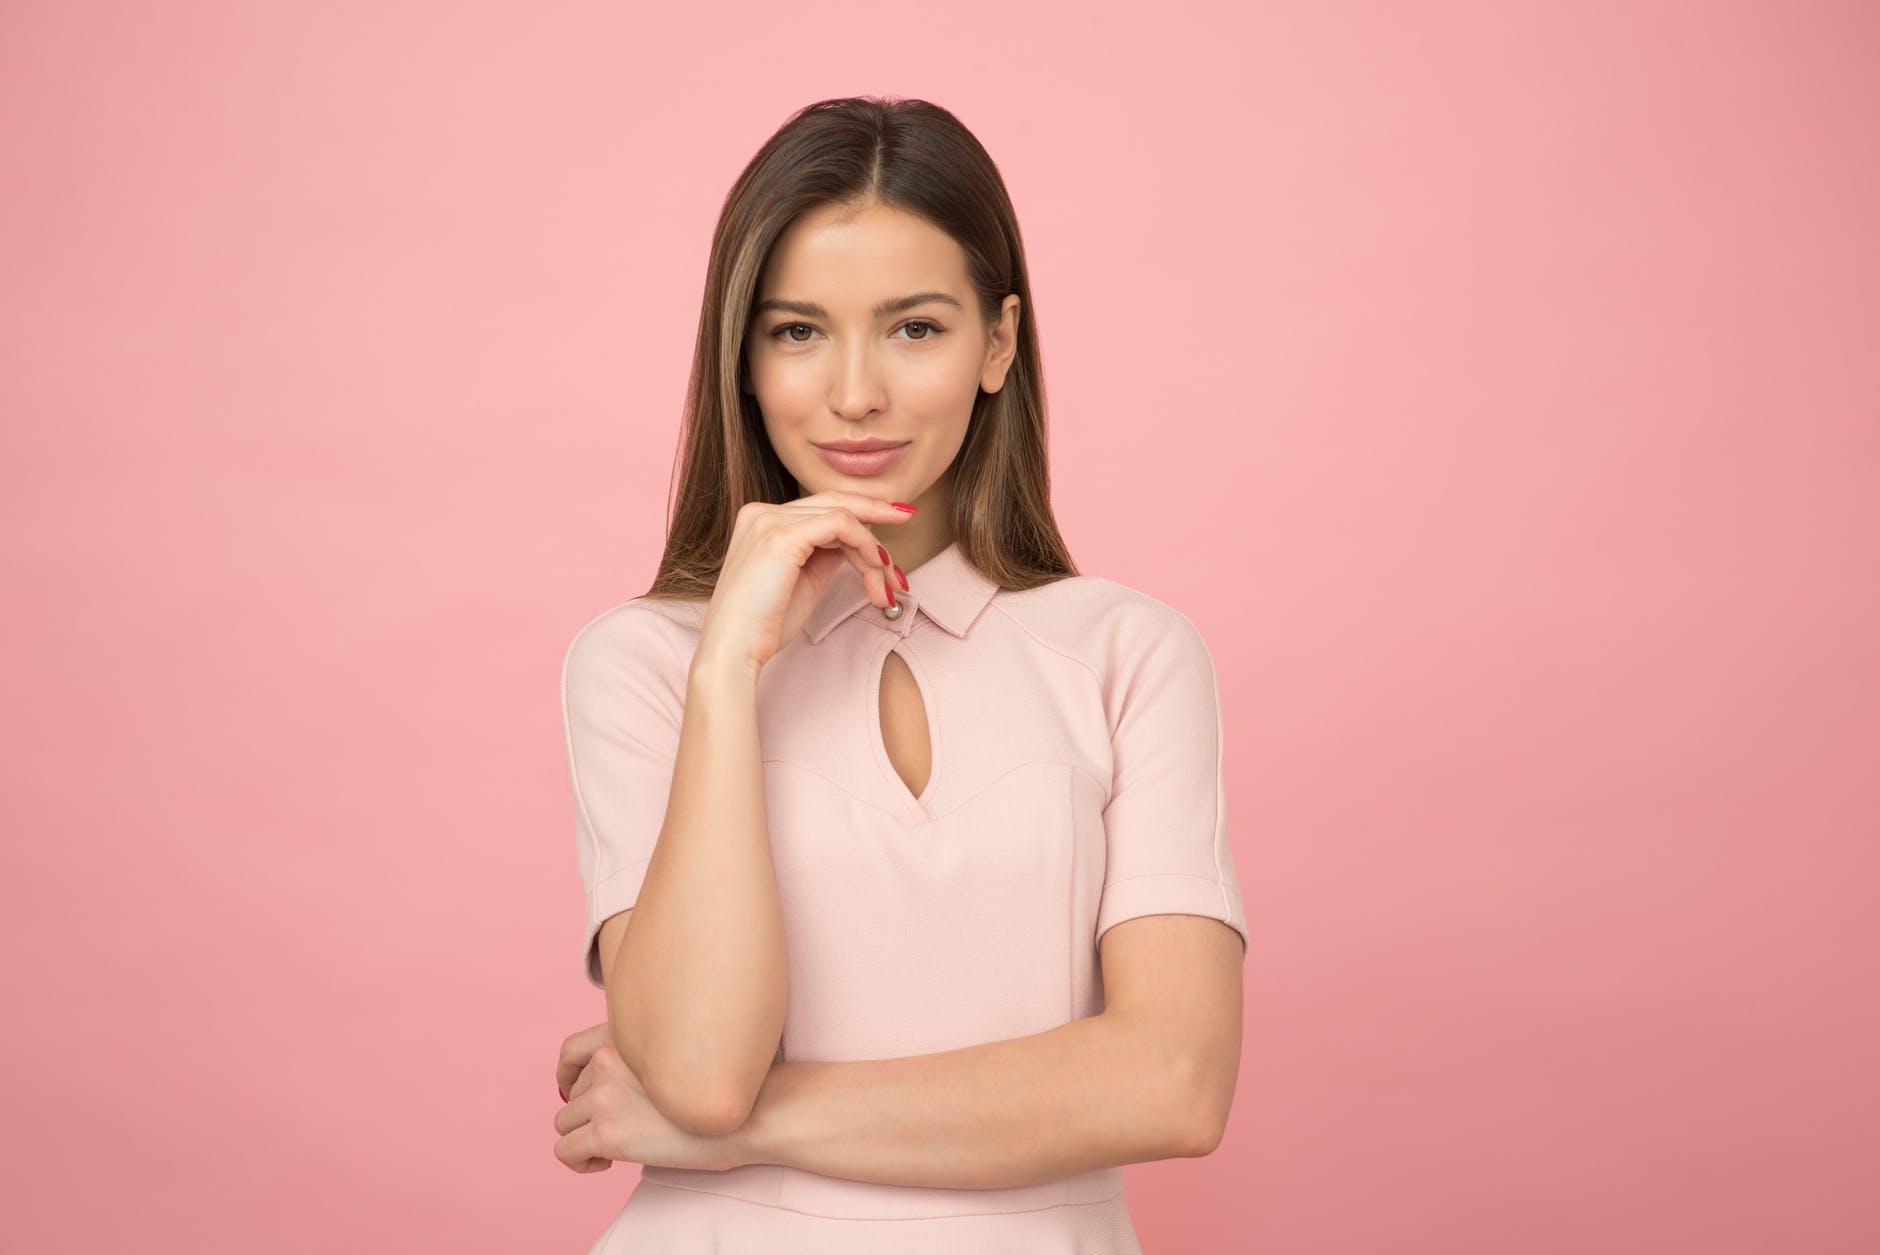 Kako se rešiti neredovnih i bolnih menstruacija?